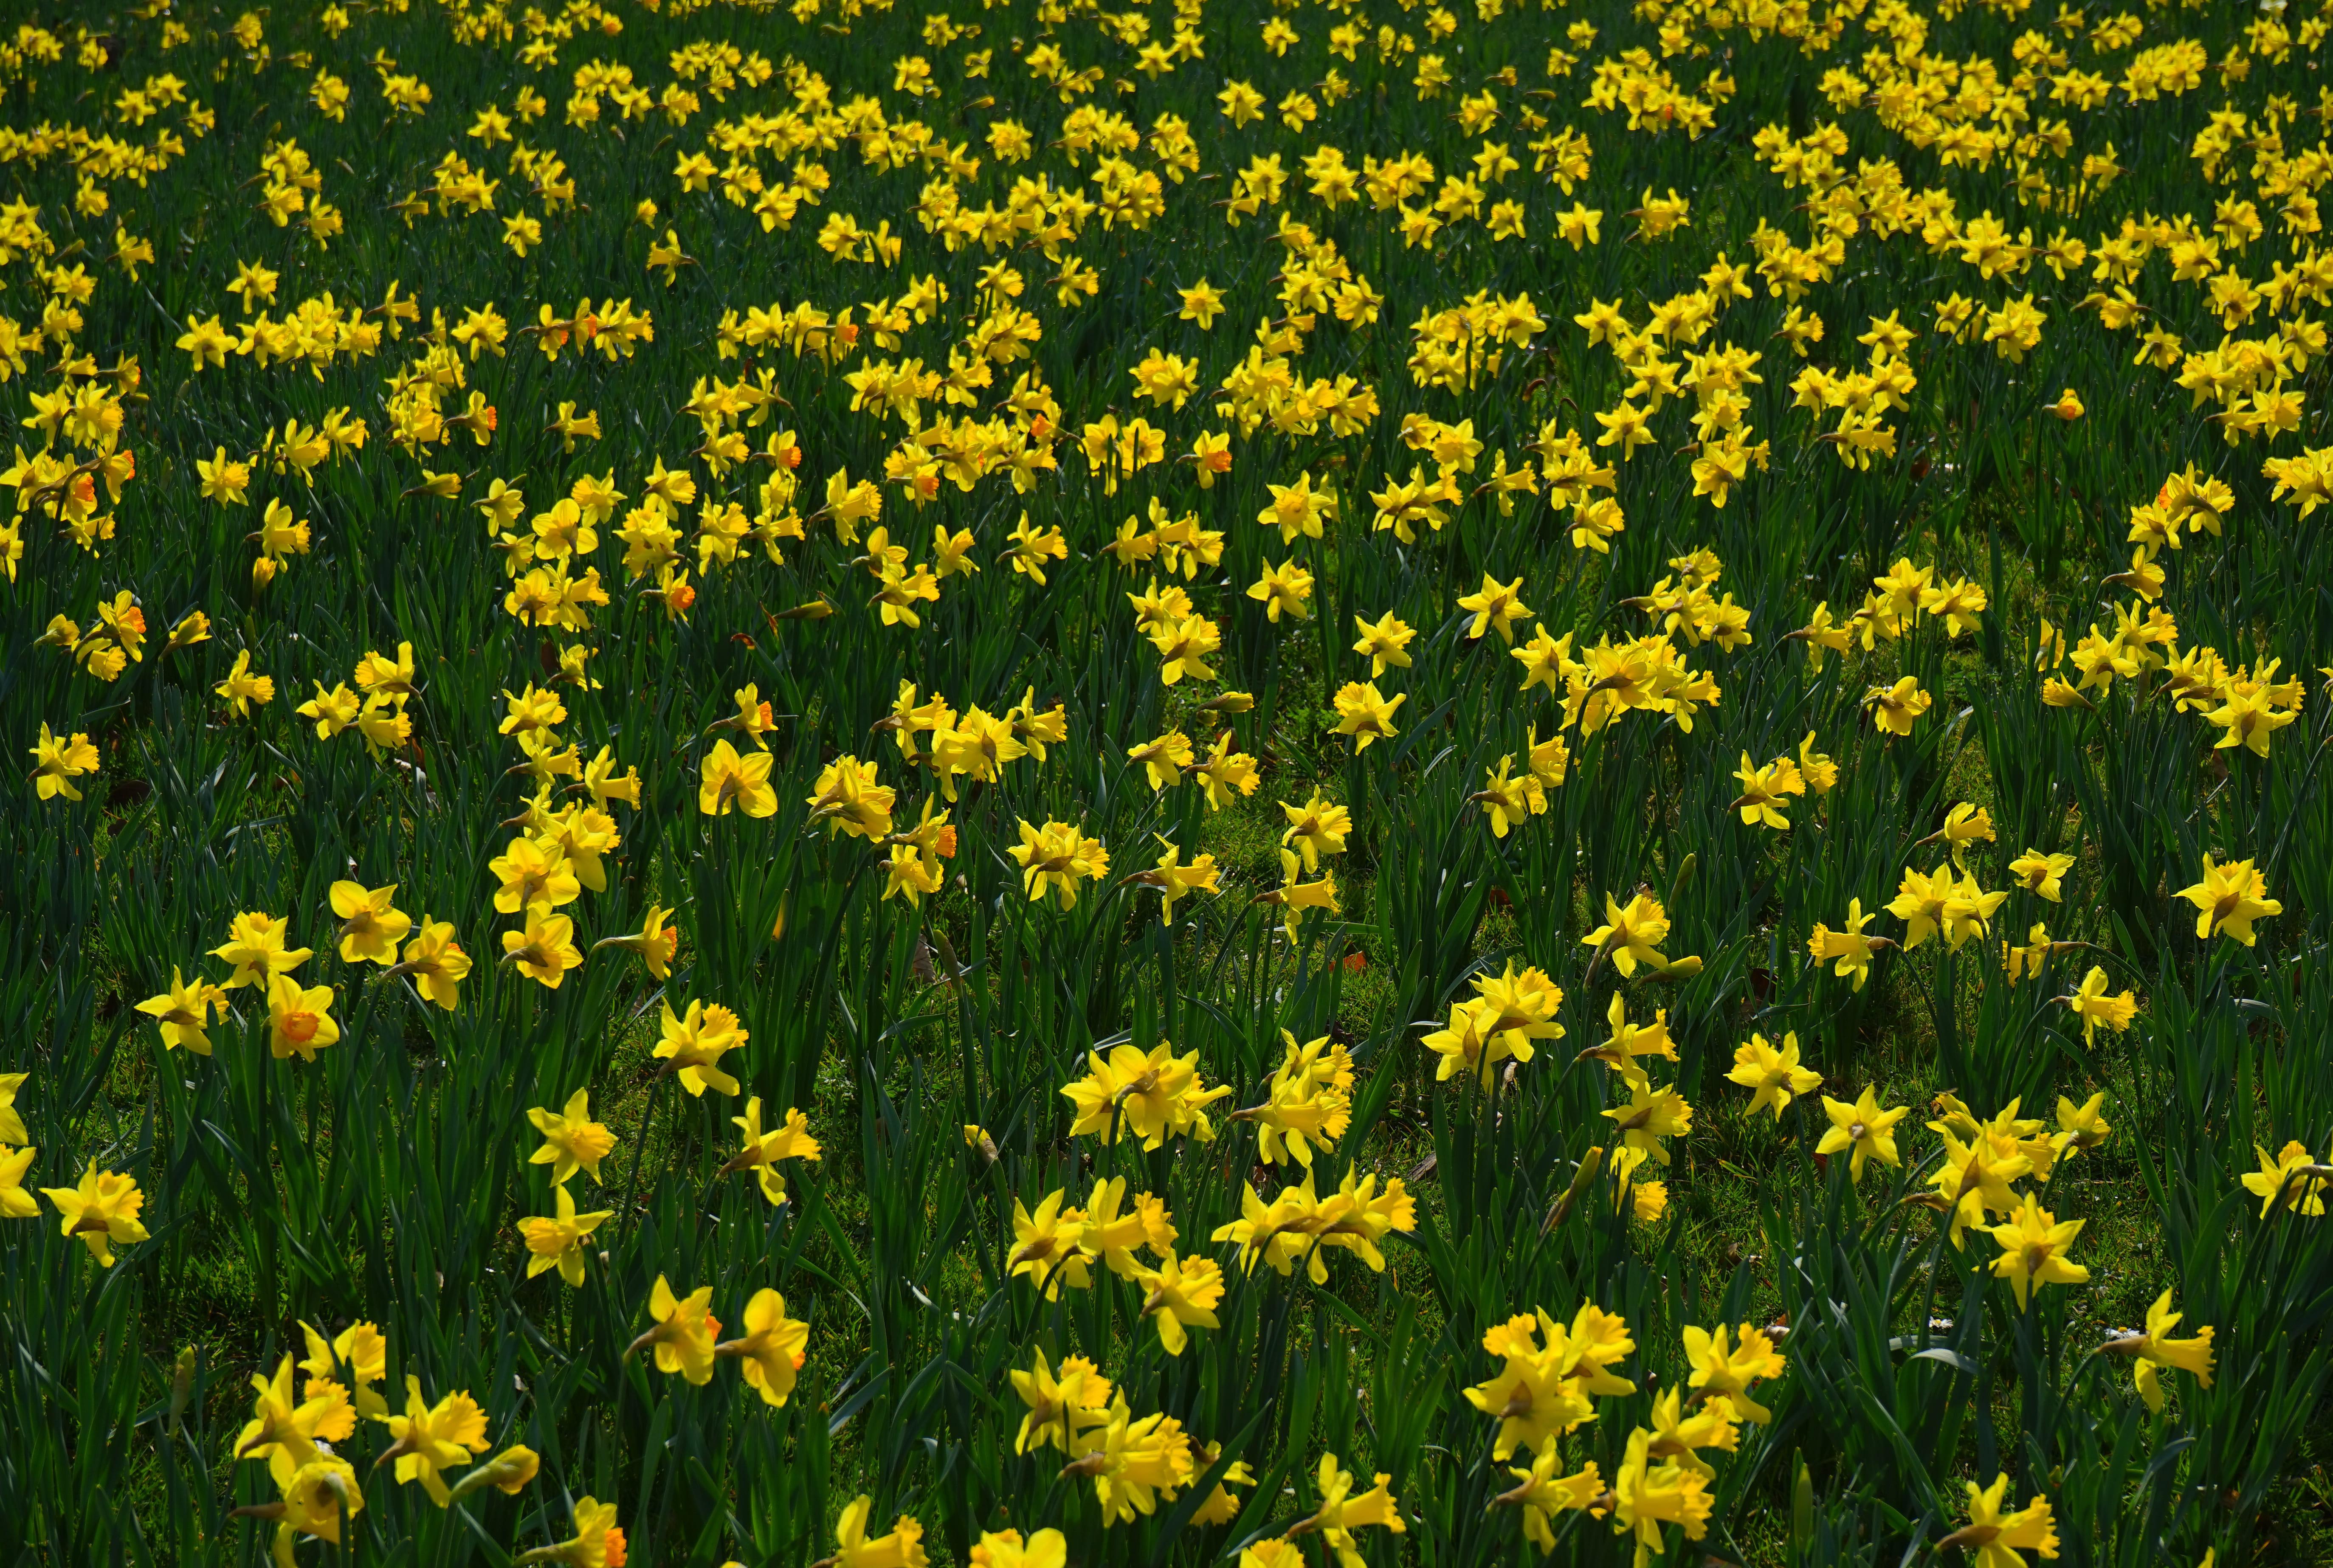 daffodils-photo-85